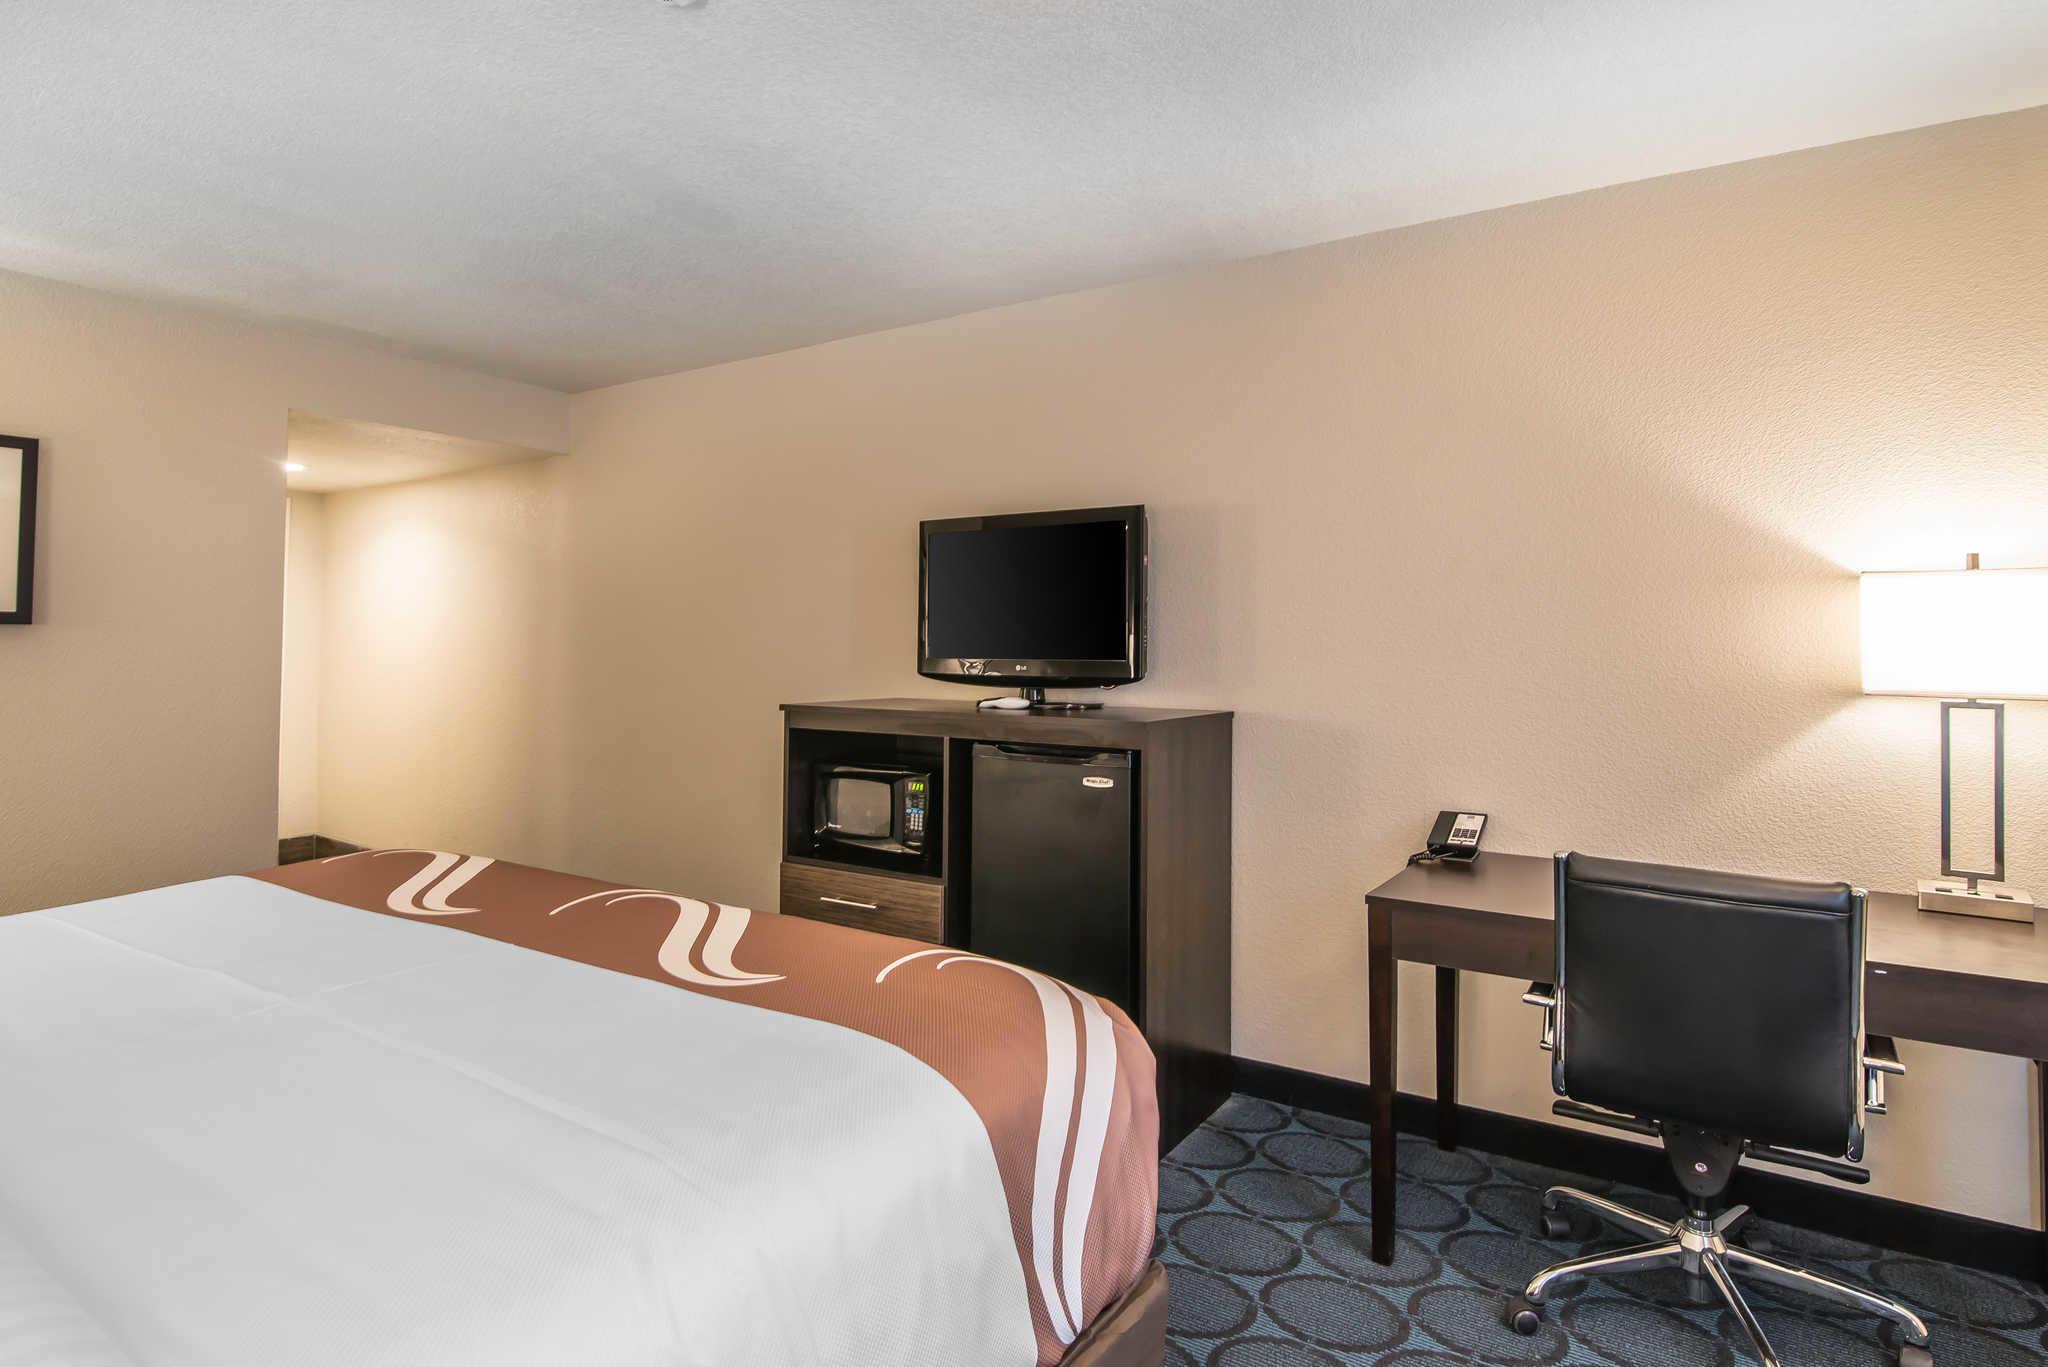 Quality Inn & Suites - Ruidoso Hwy 70 image 10